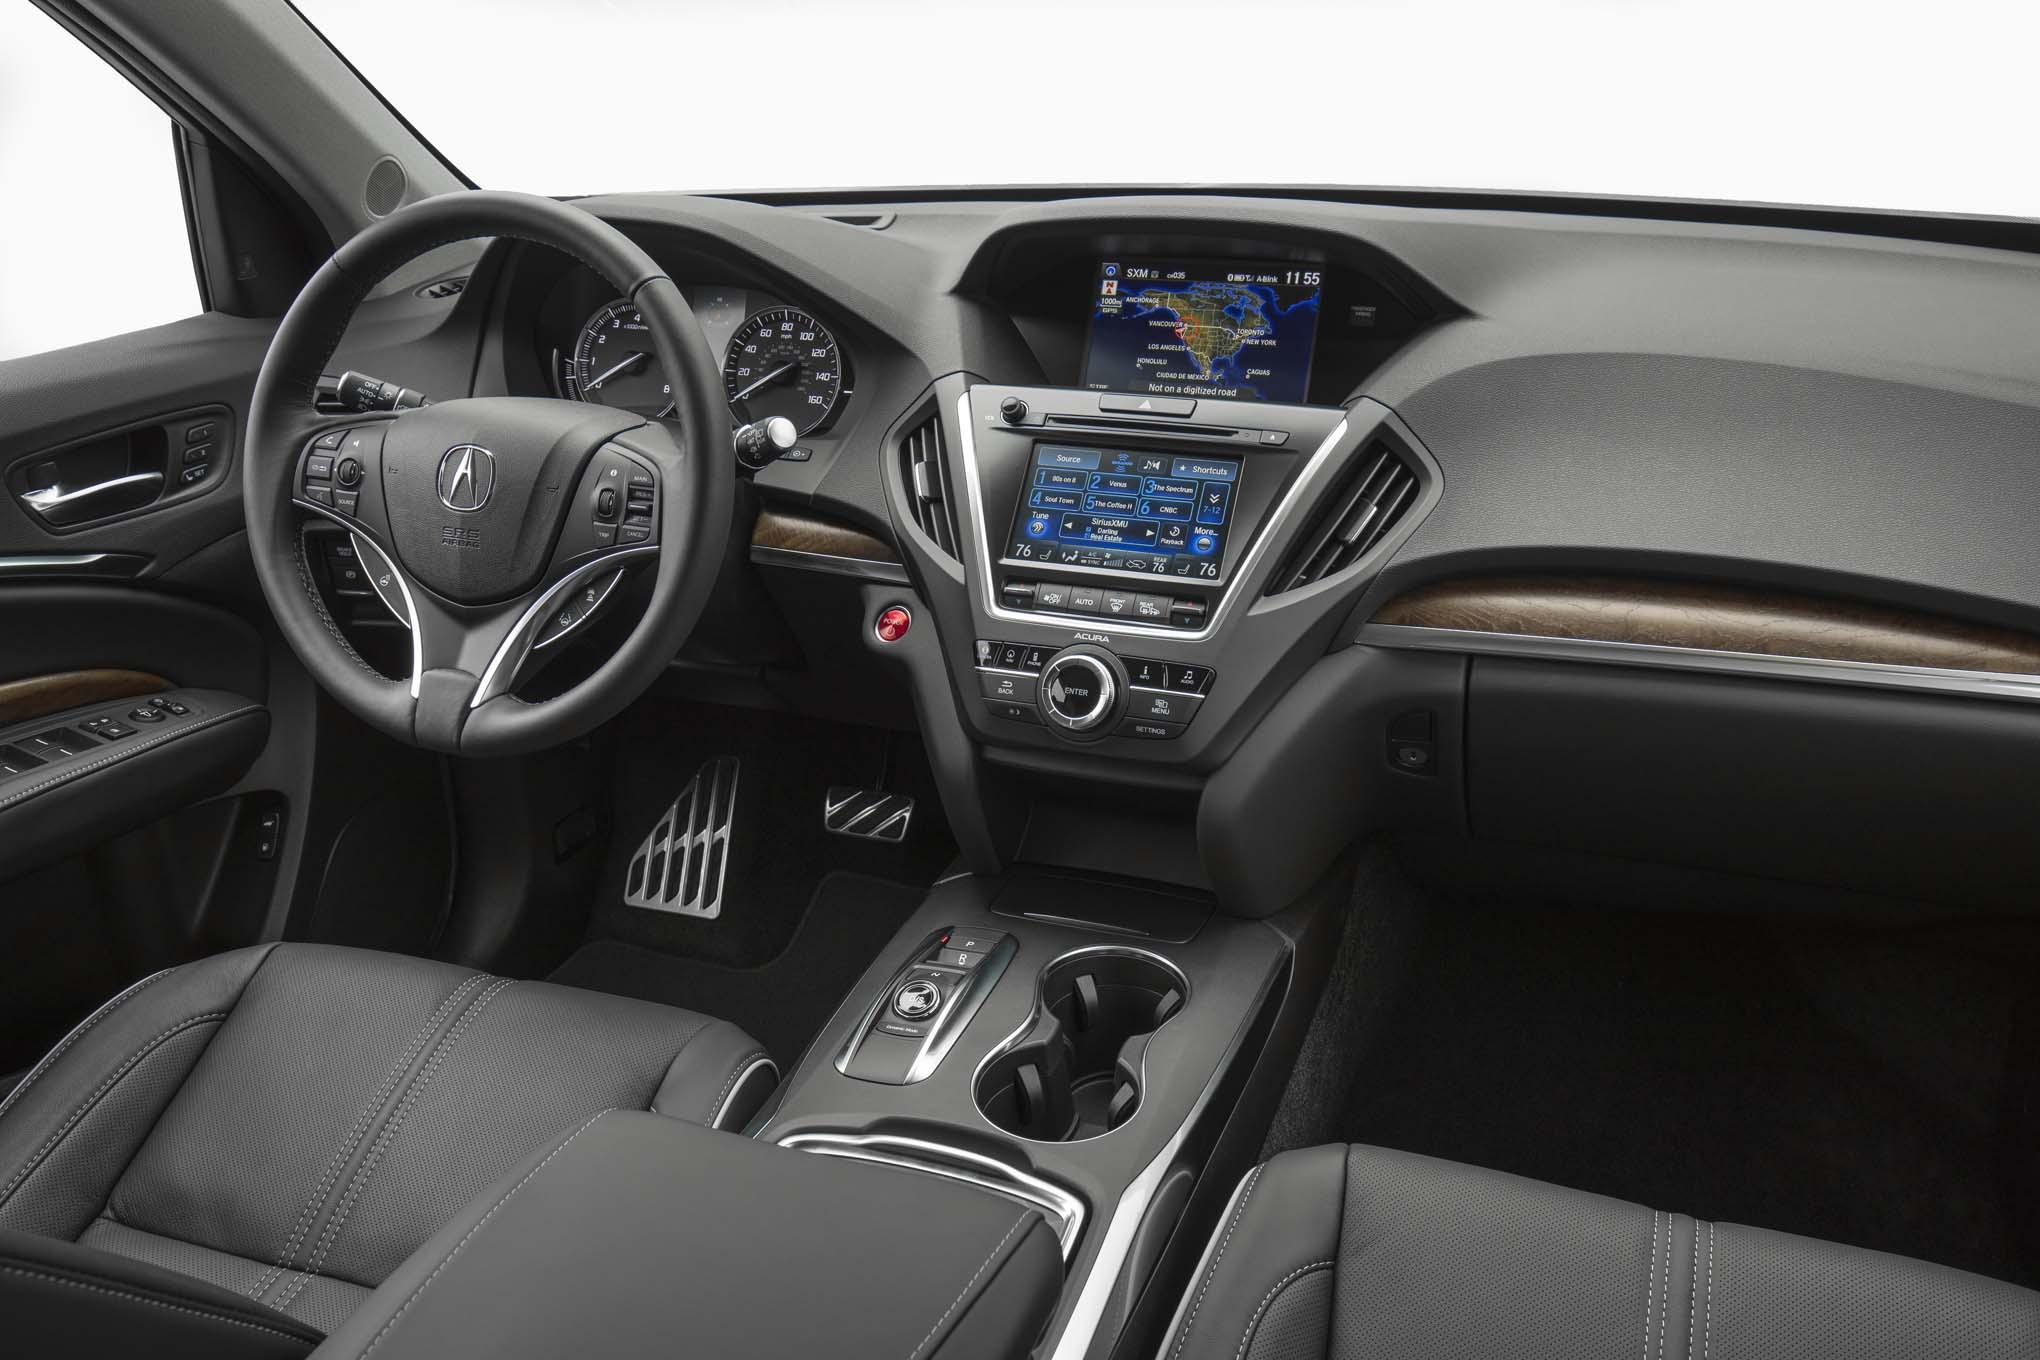 2017-Acura-MDX-Hybrid-interior-